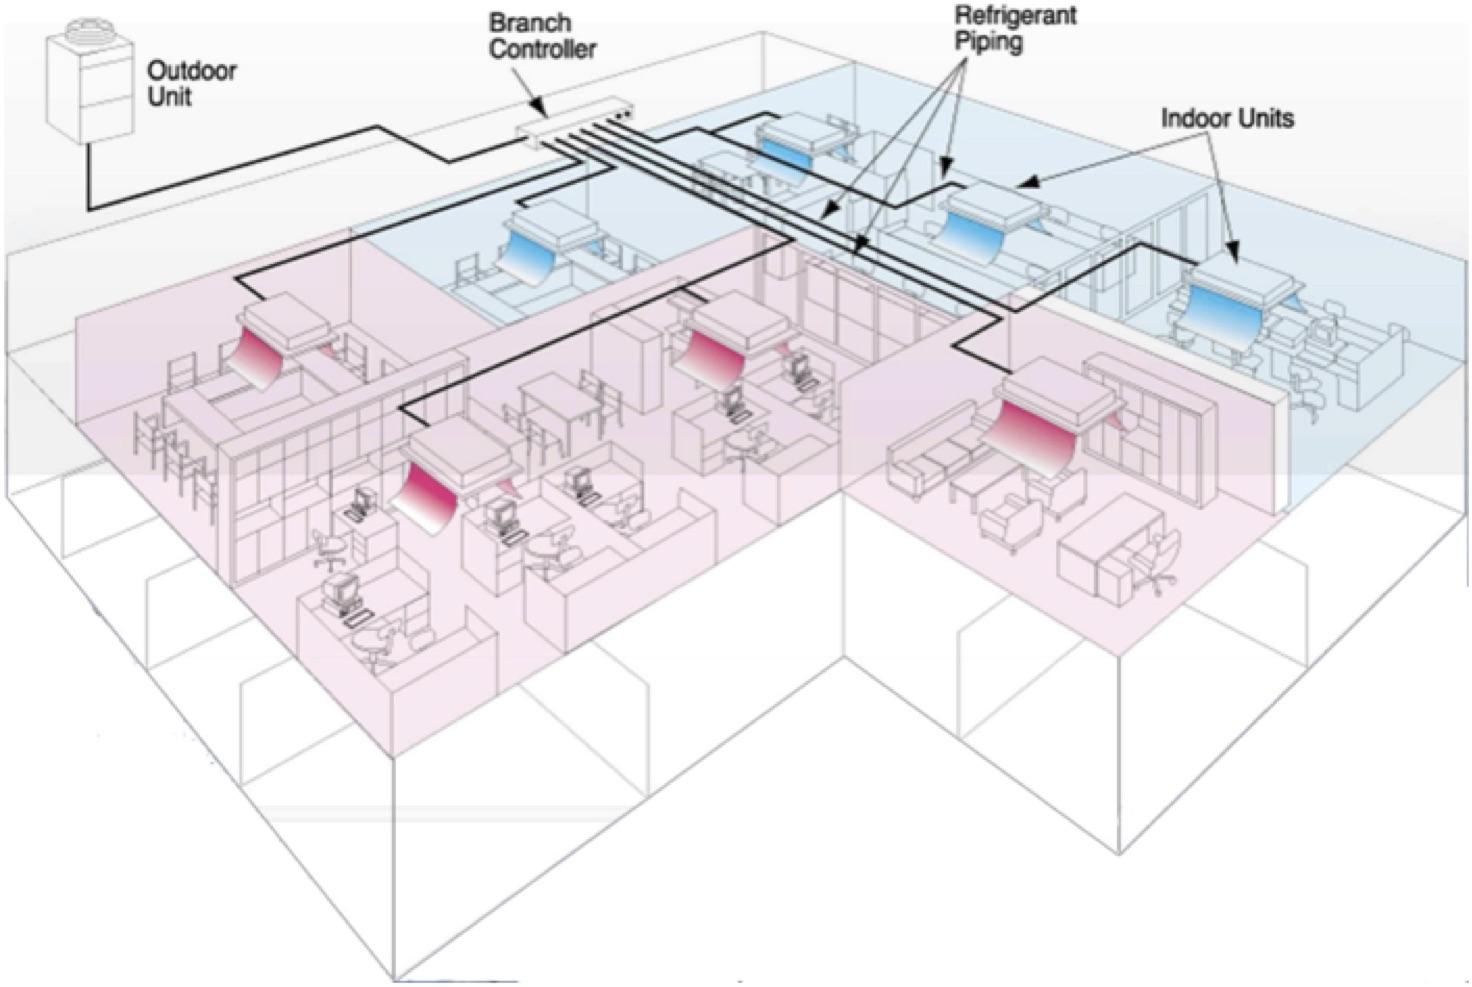 hight resolution of enersolv multi zone vrf system diagram